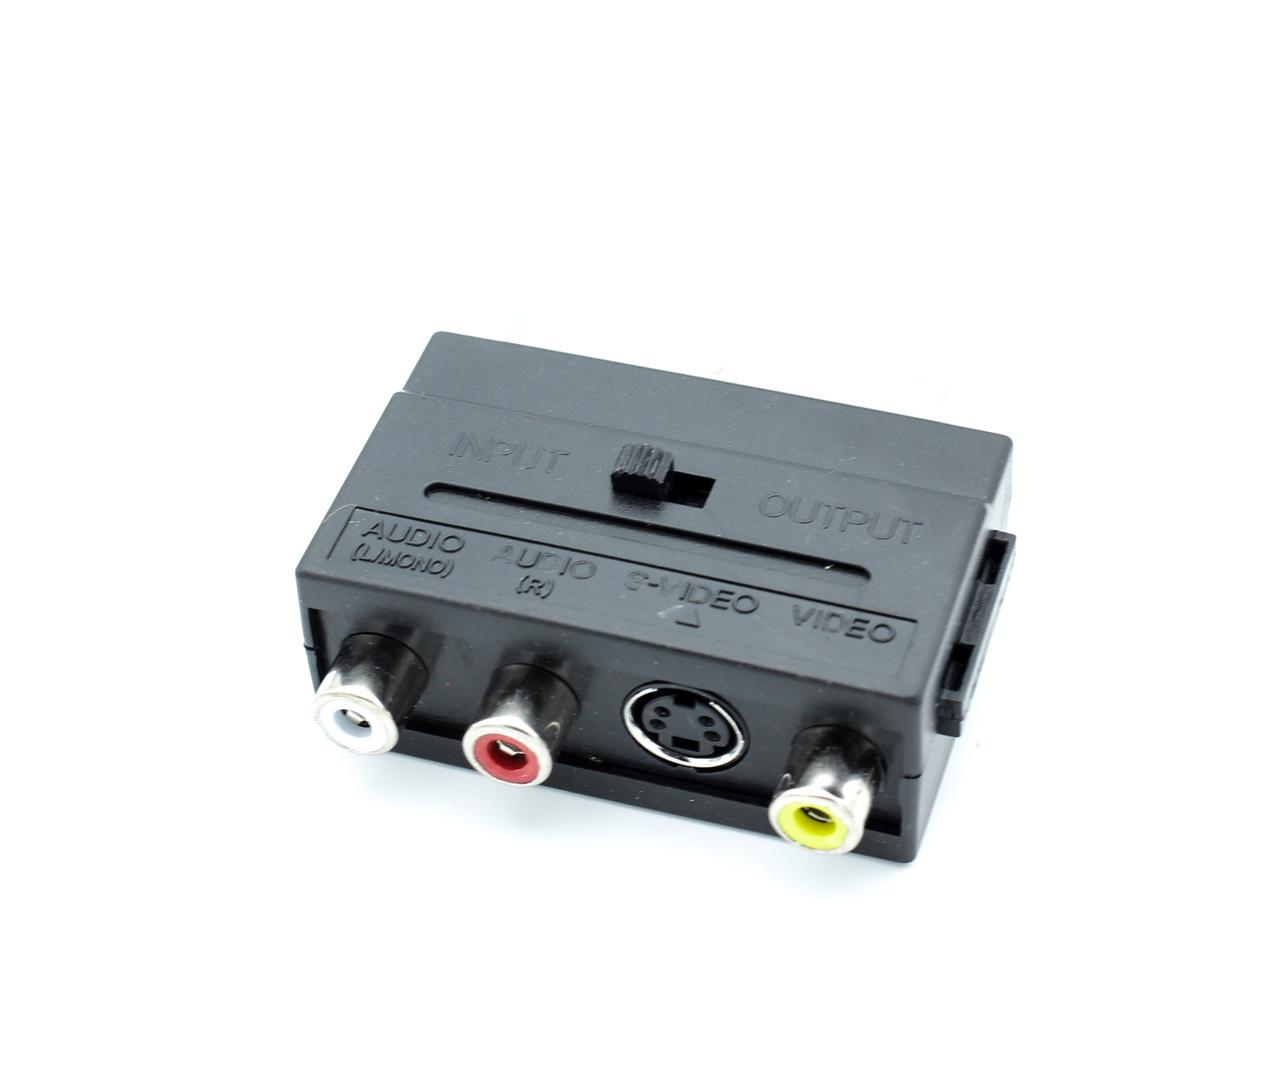 Адаптер SCART RCA S-Video (двусторонний) переходник рца с-видео композит